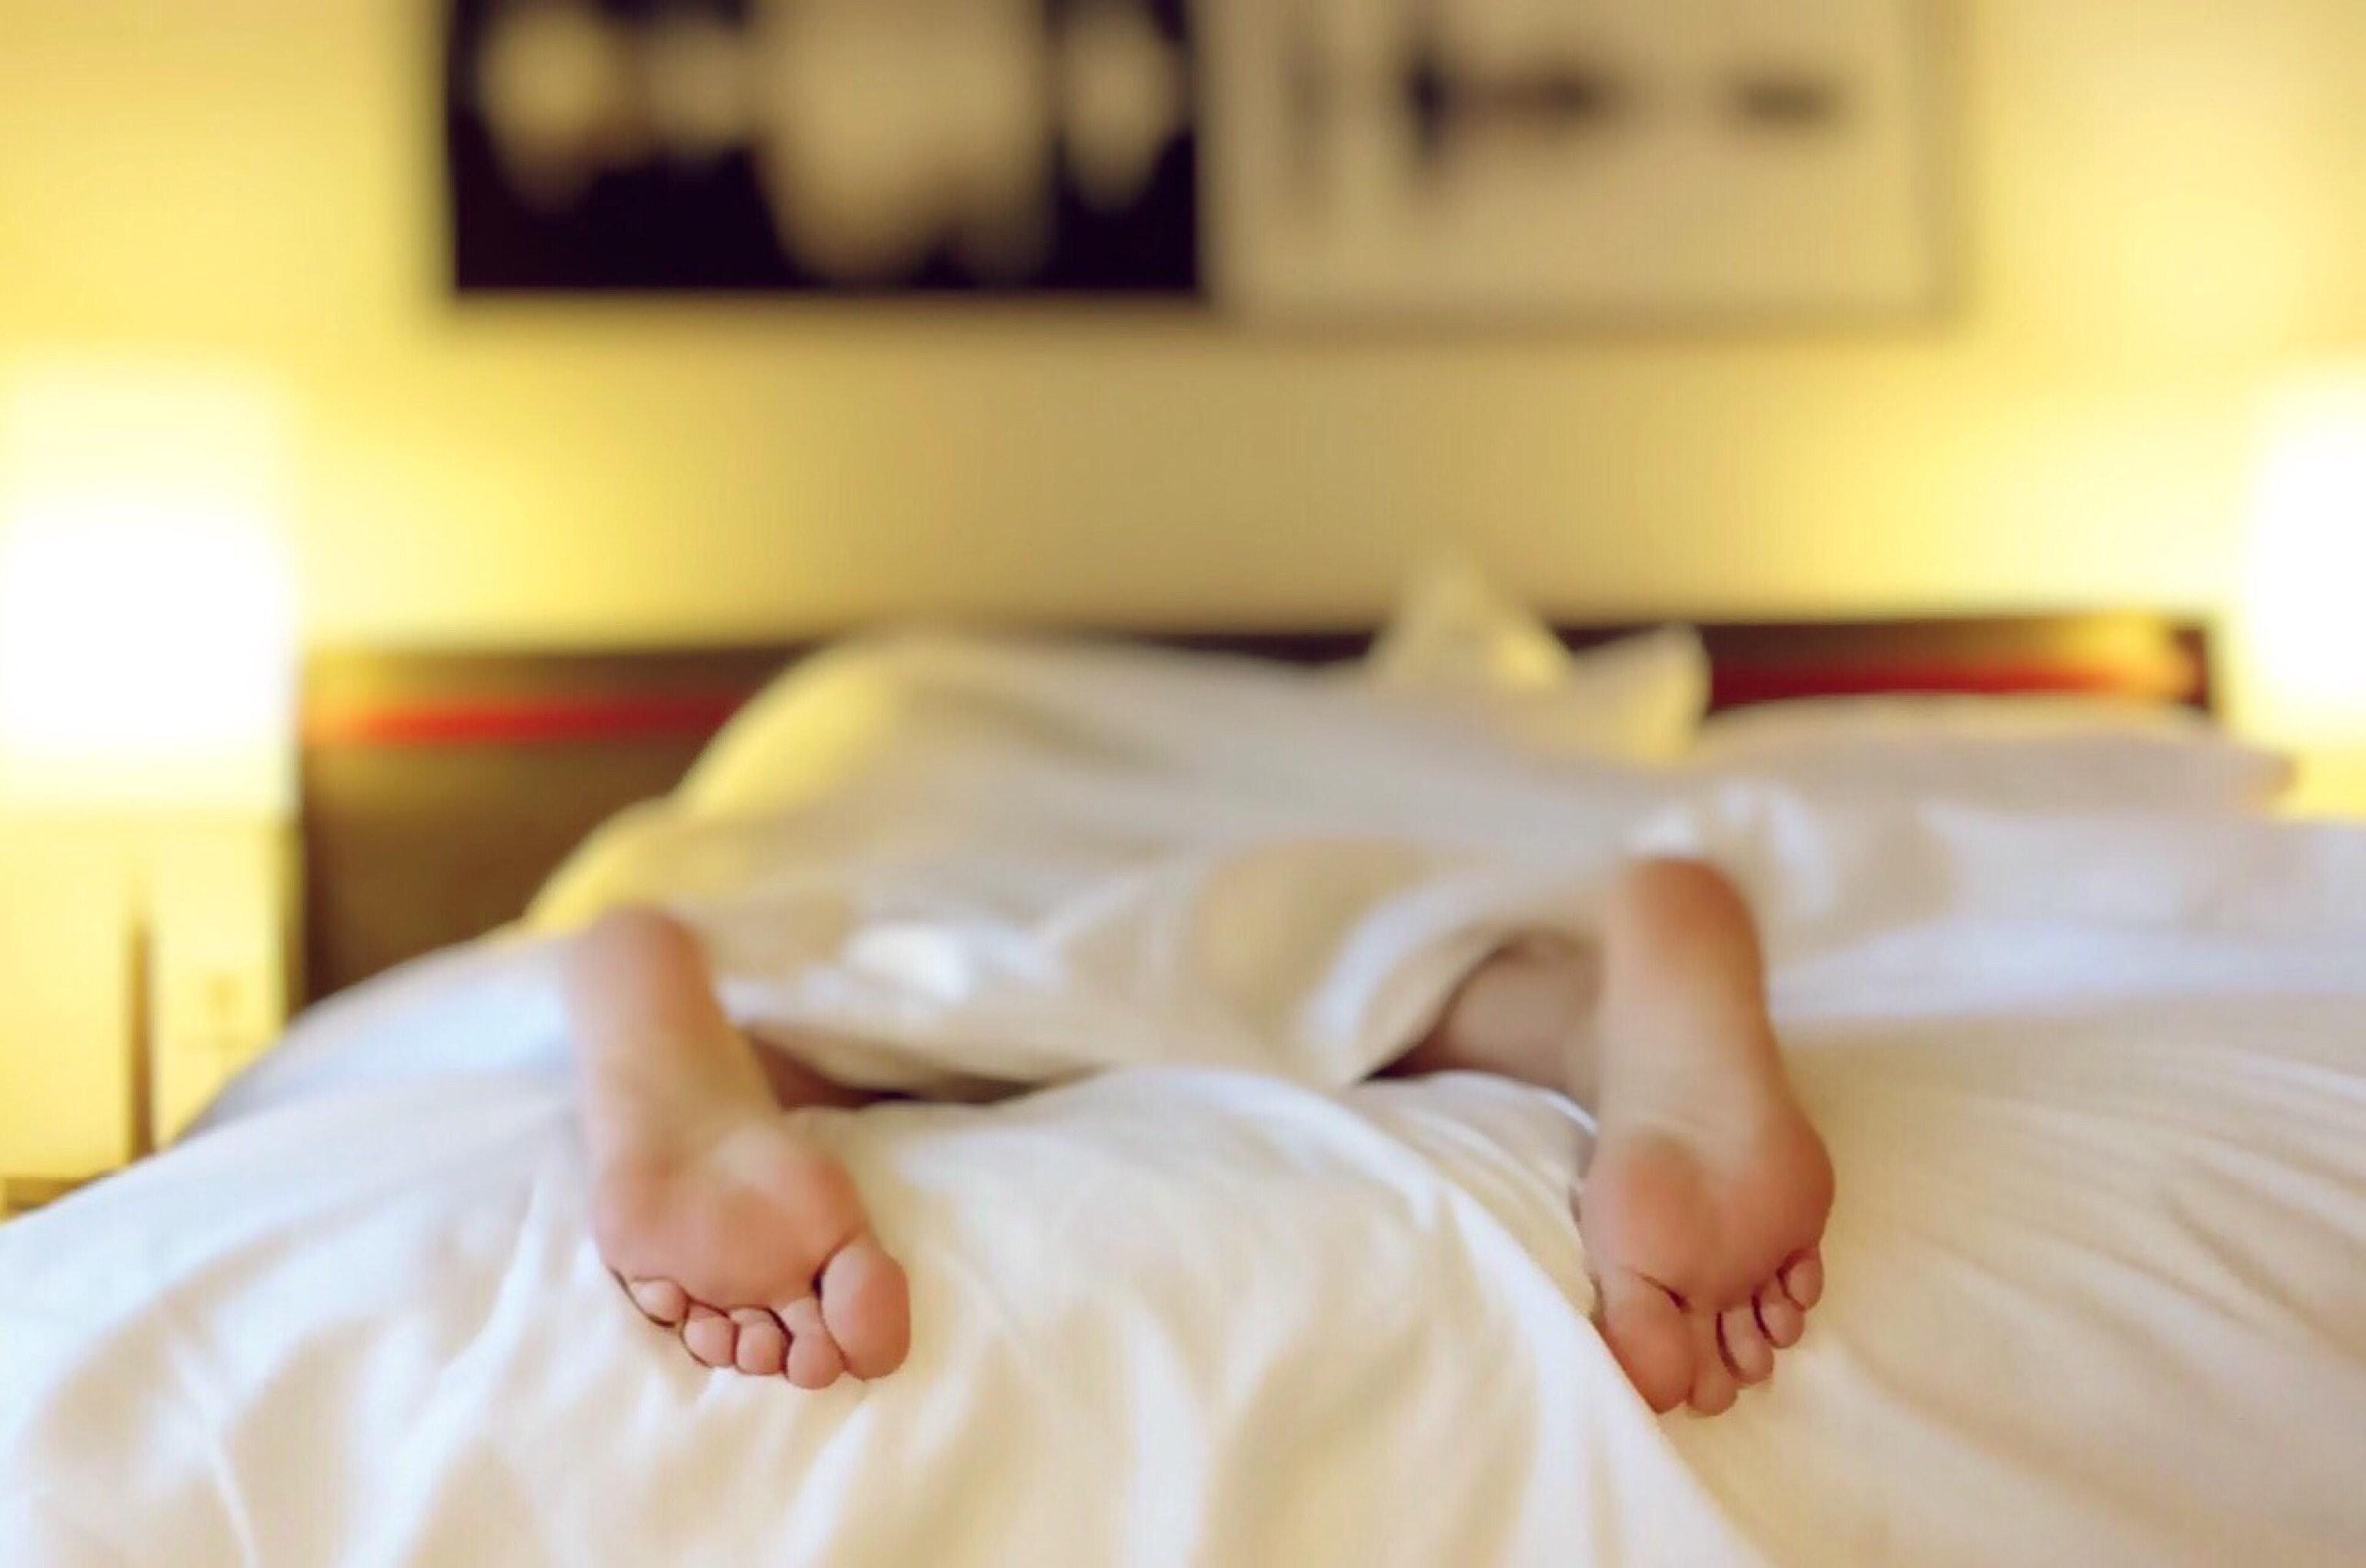 alone-bed-bedroom-blur-271897